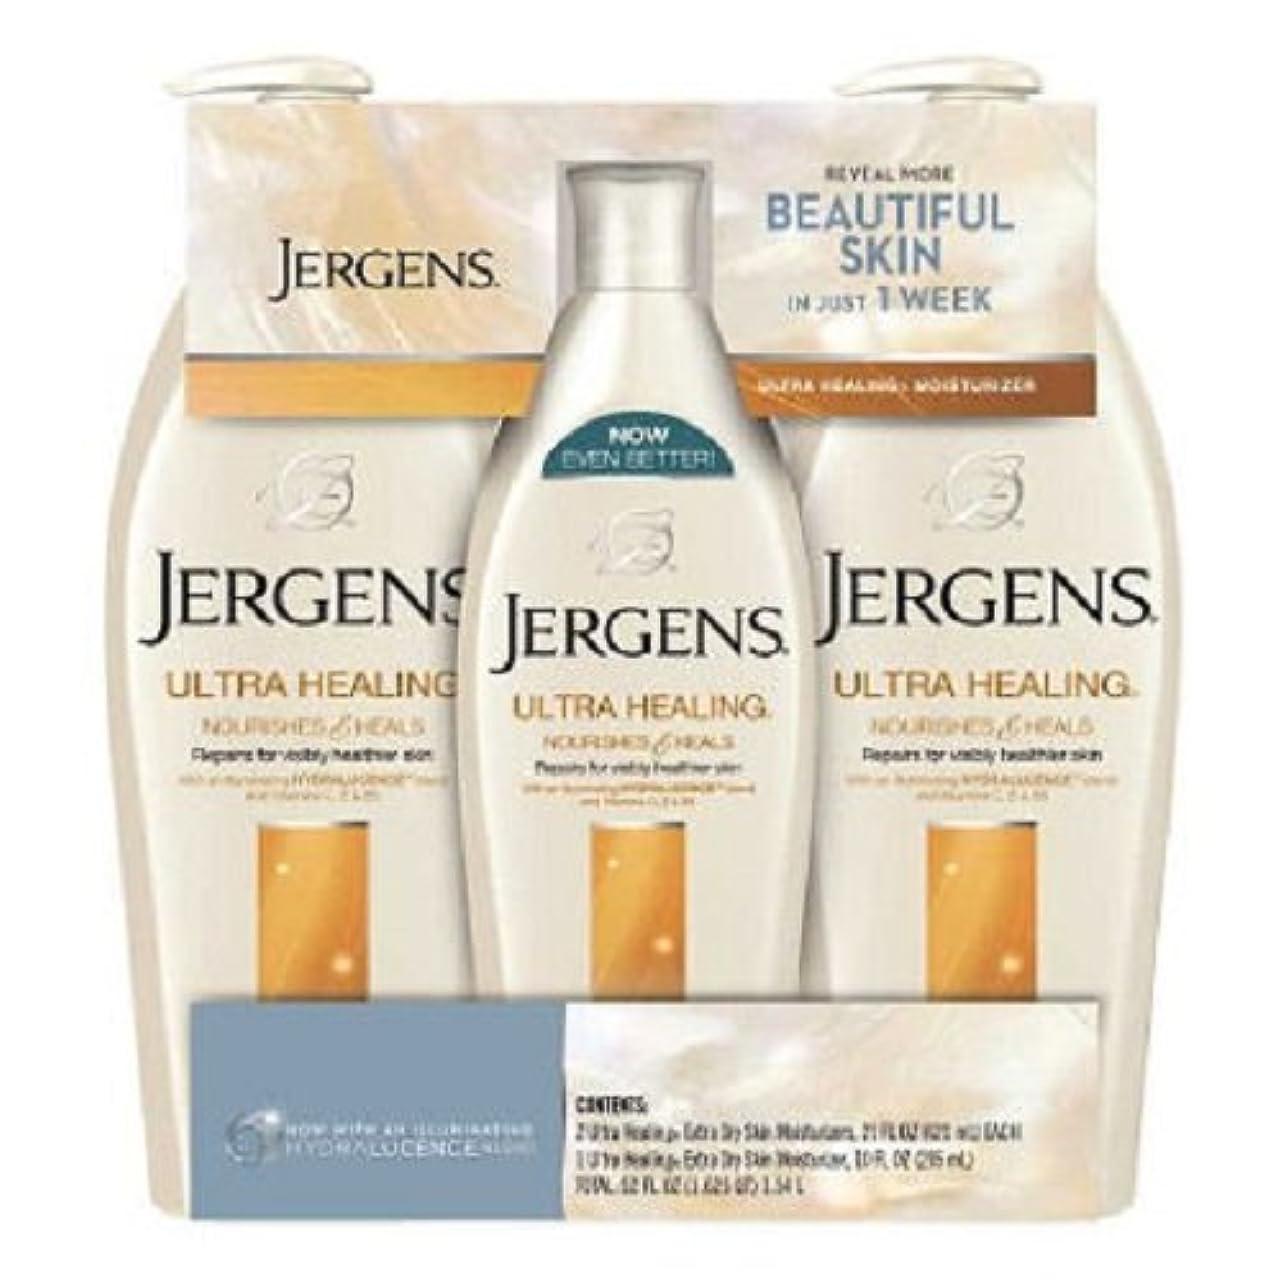 置換間接的慈悲Jergens Ultra Healing Lotion Triple Pack 2 / 21 Oz. Bottles And 1 / 10 Ounce